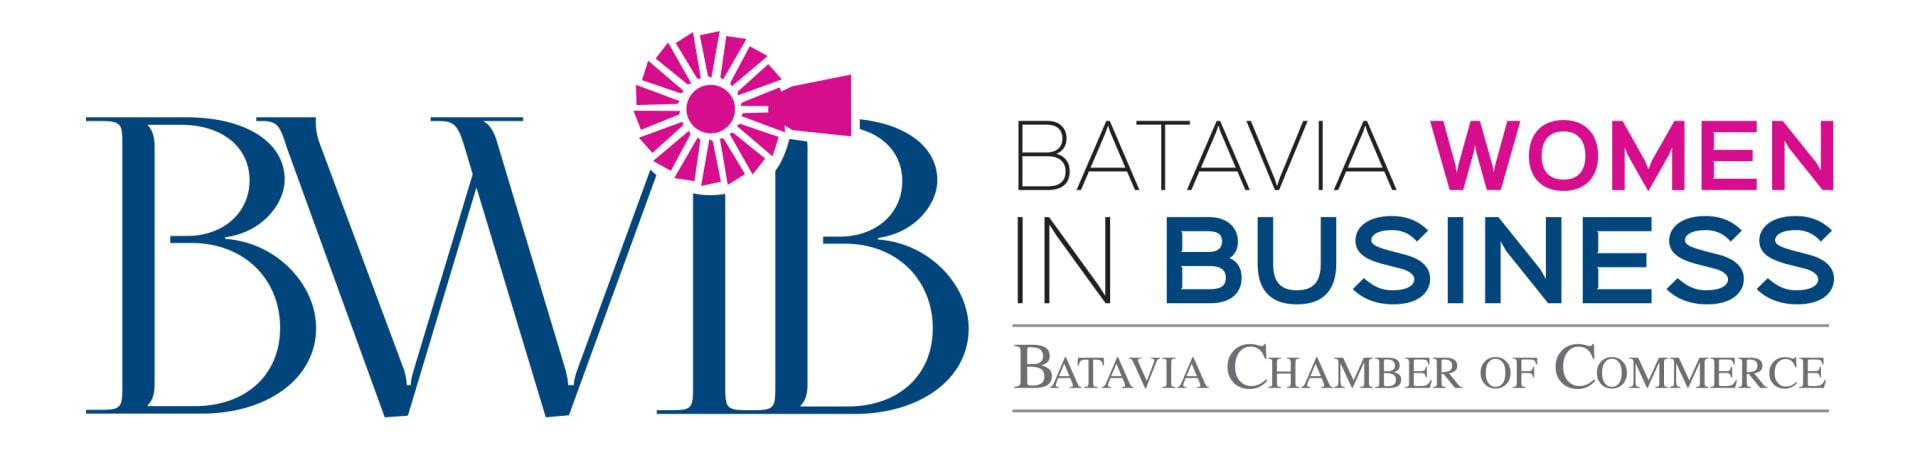 BWIB-new-2(1).jpg